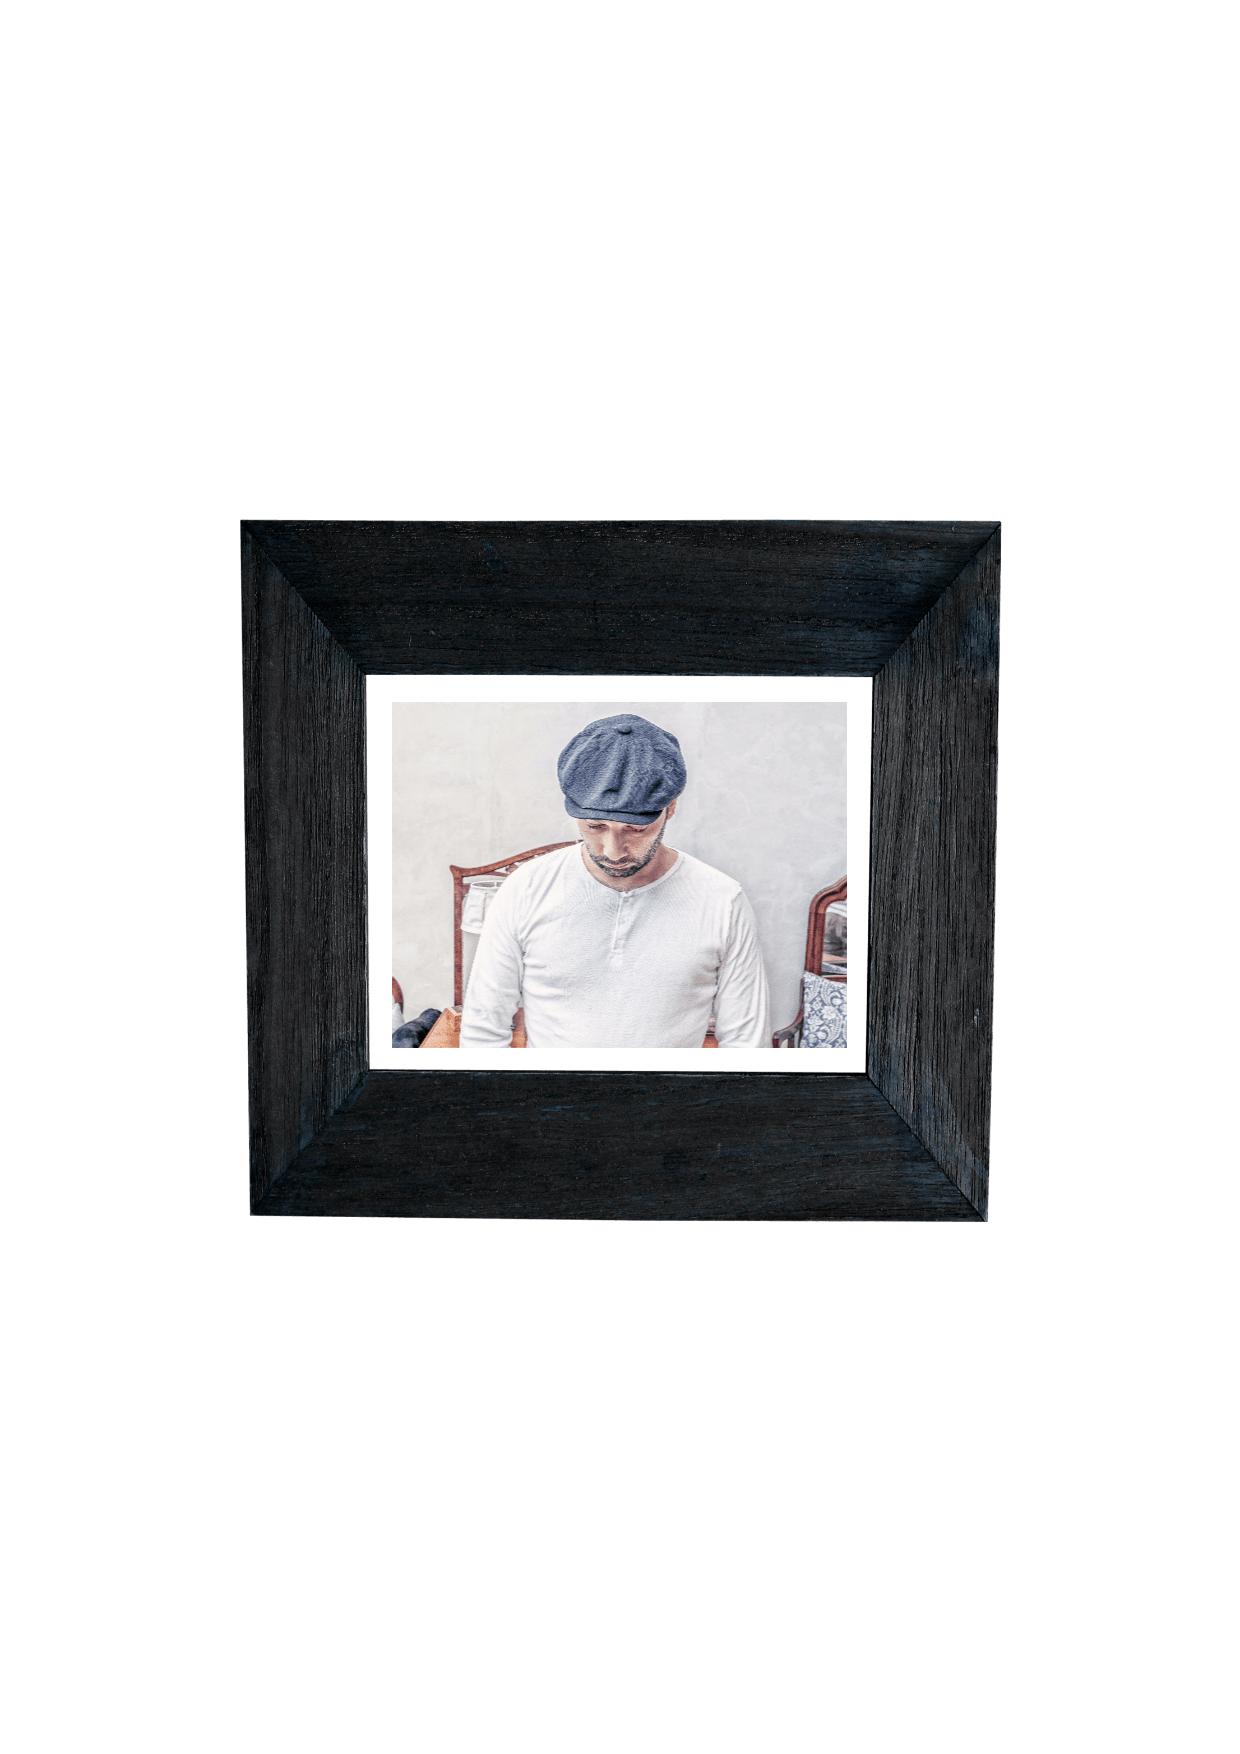 Picture,                Frame,                Product,                Mockup,                Image,                Avatar,                White,                Black,                 Free Image